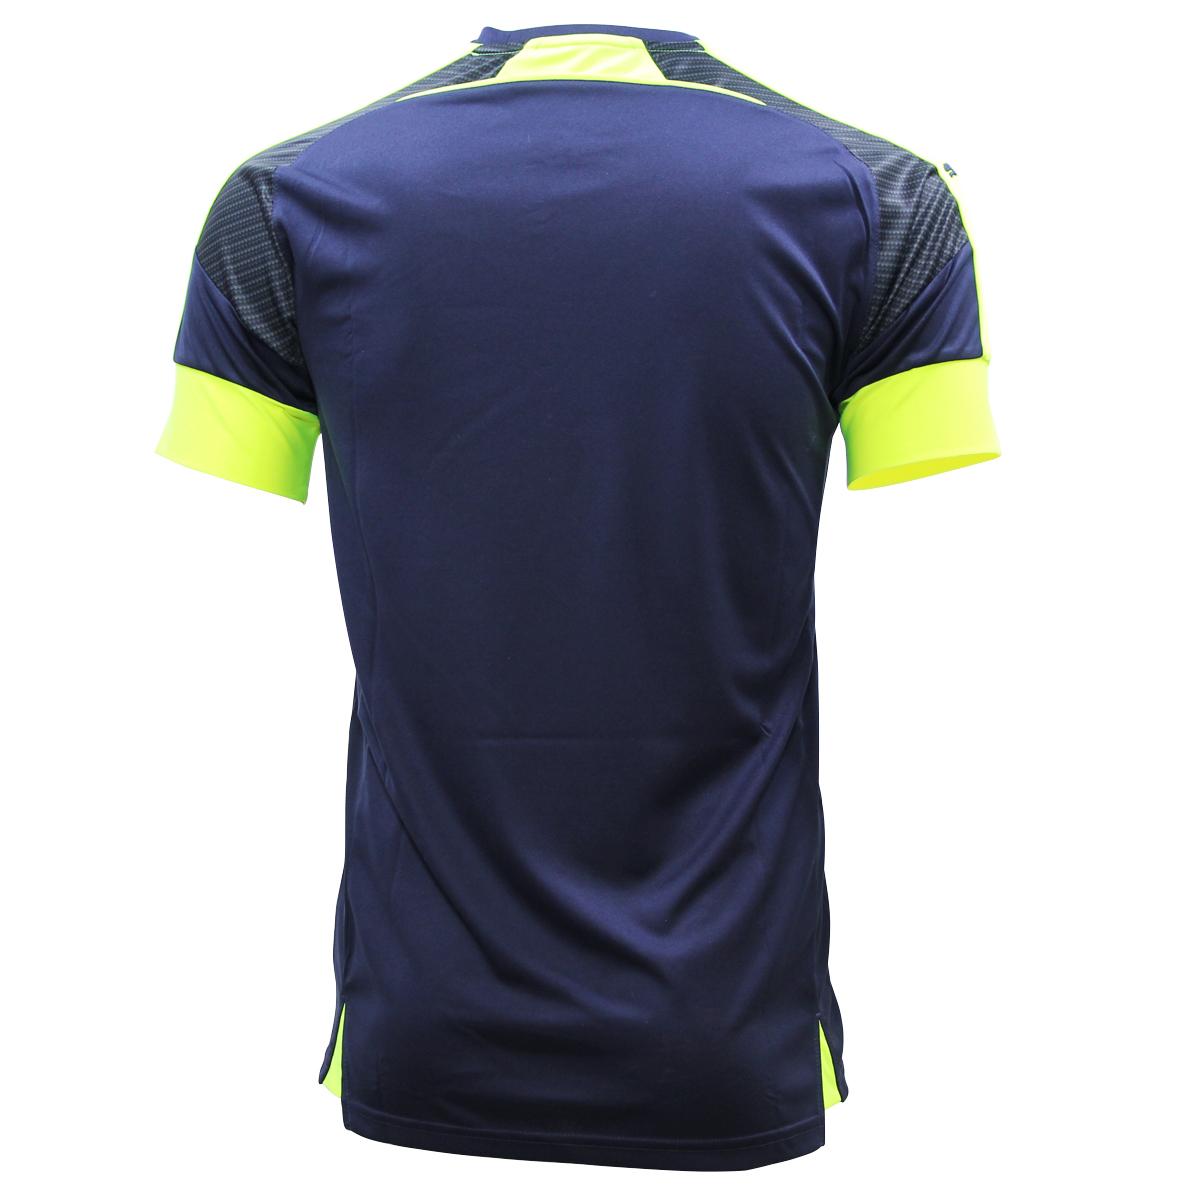 ff3b0b5ba Puma ARSENAL FC 3RD REPLICA JERSEY Blue Yellow Men Football Jersey ...